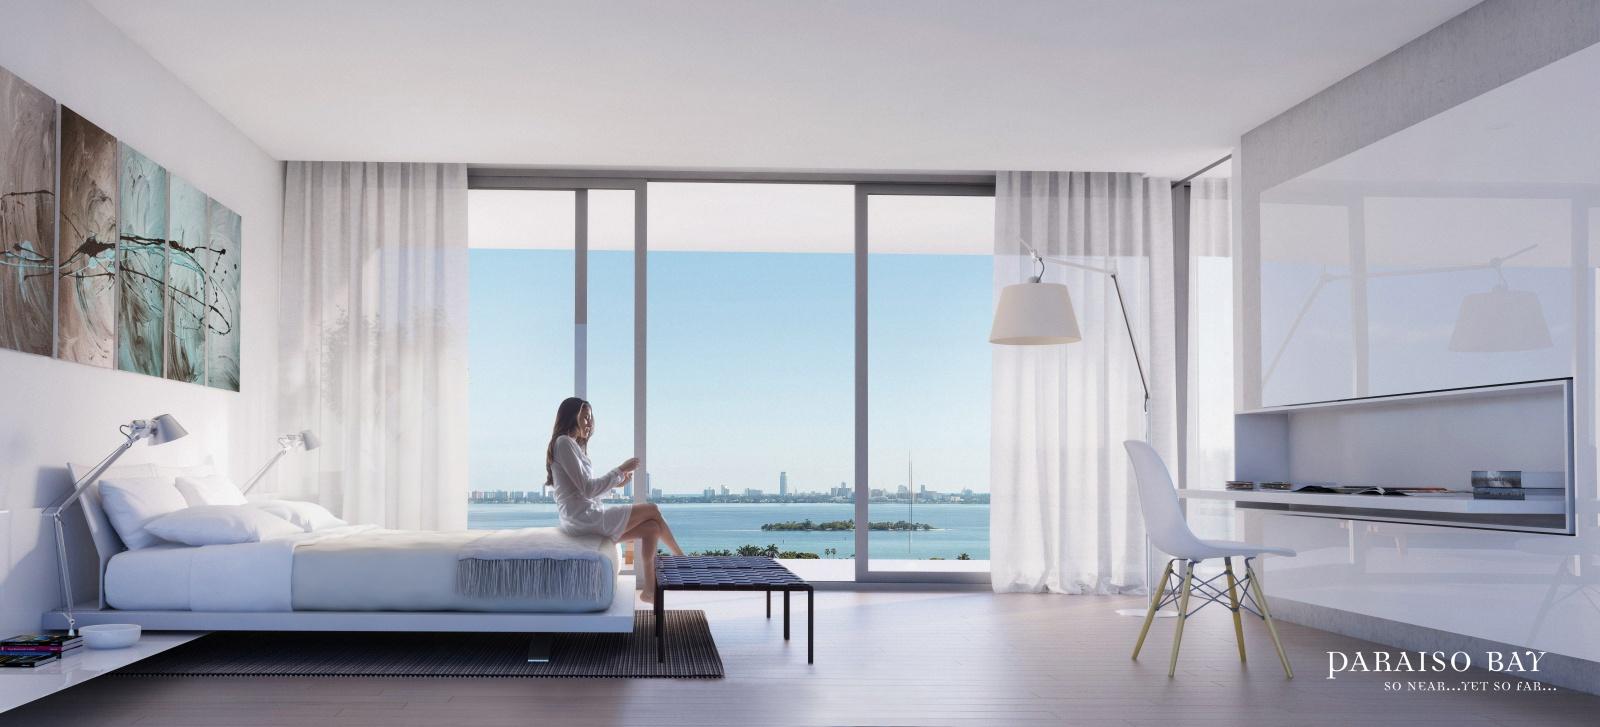 Gran Paraiso edgewater condo master bed room